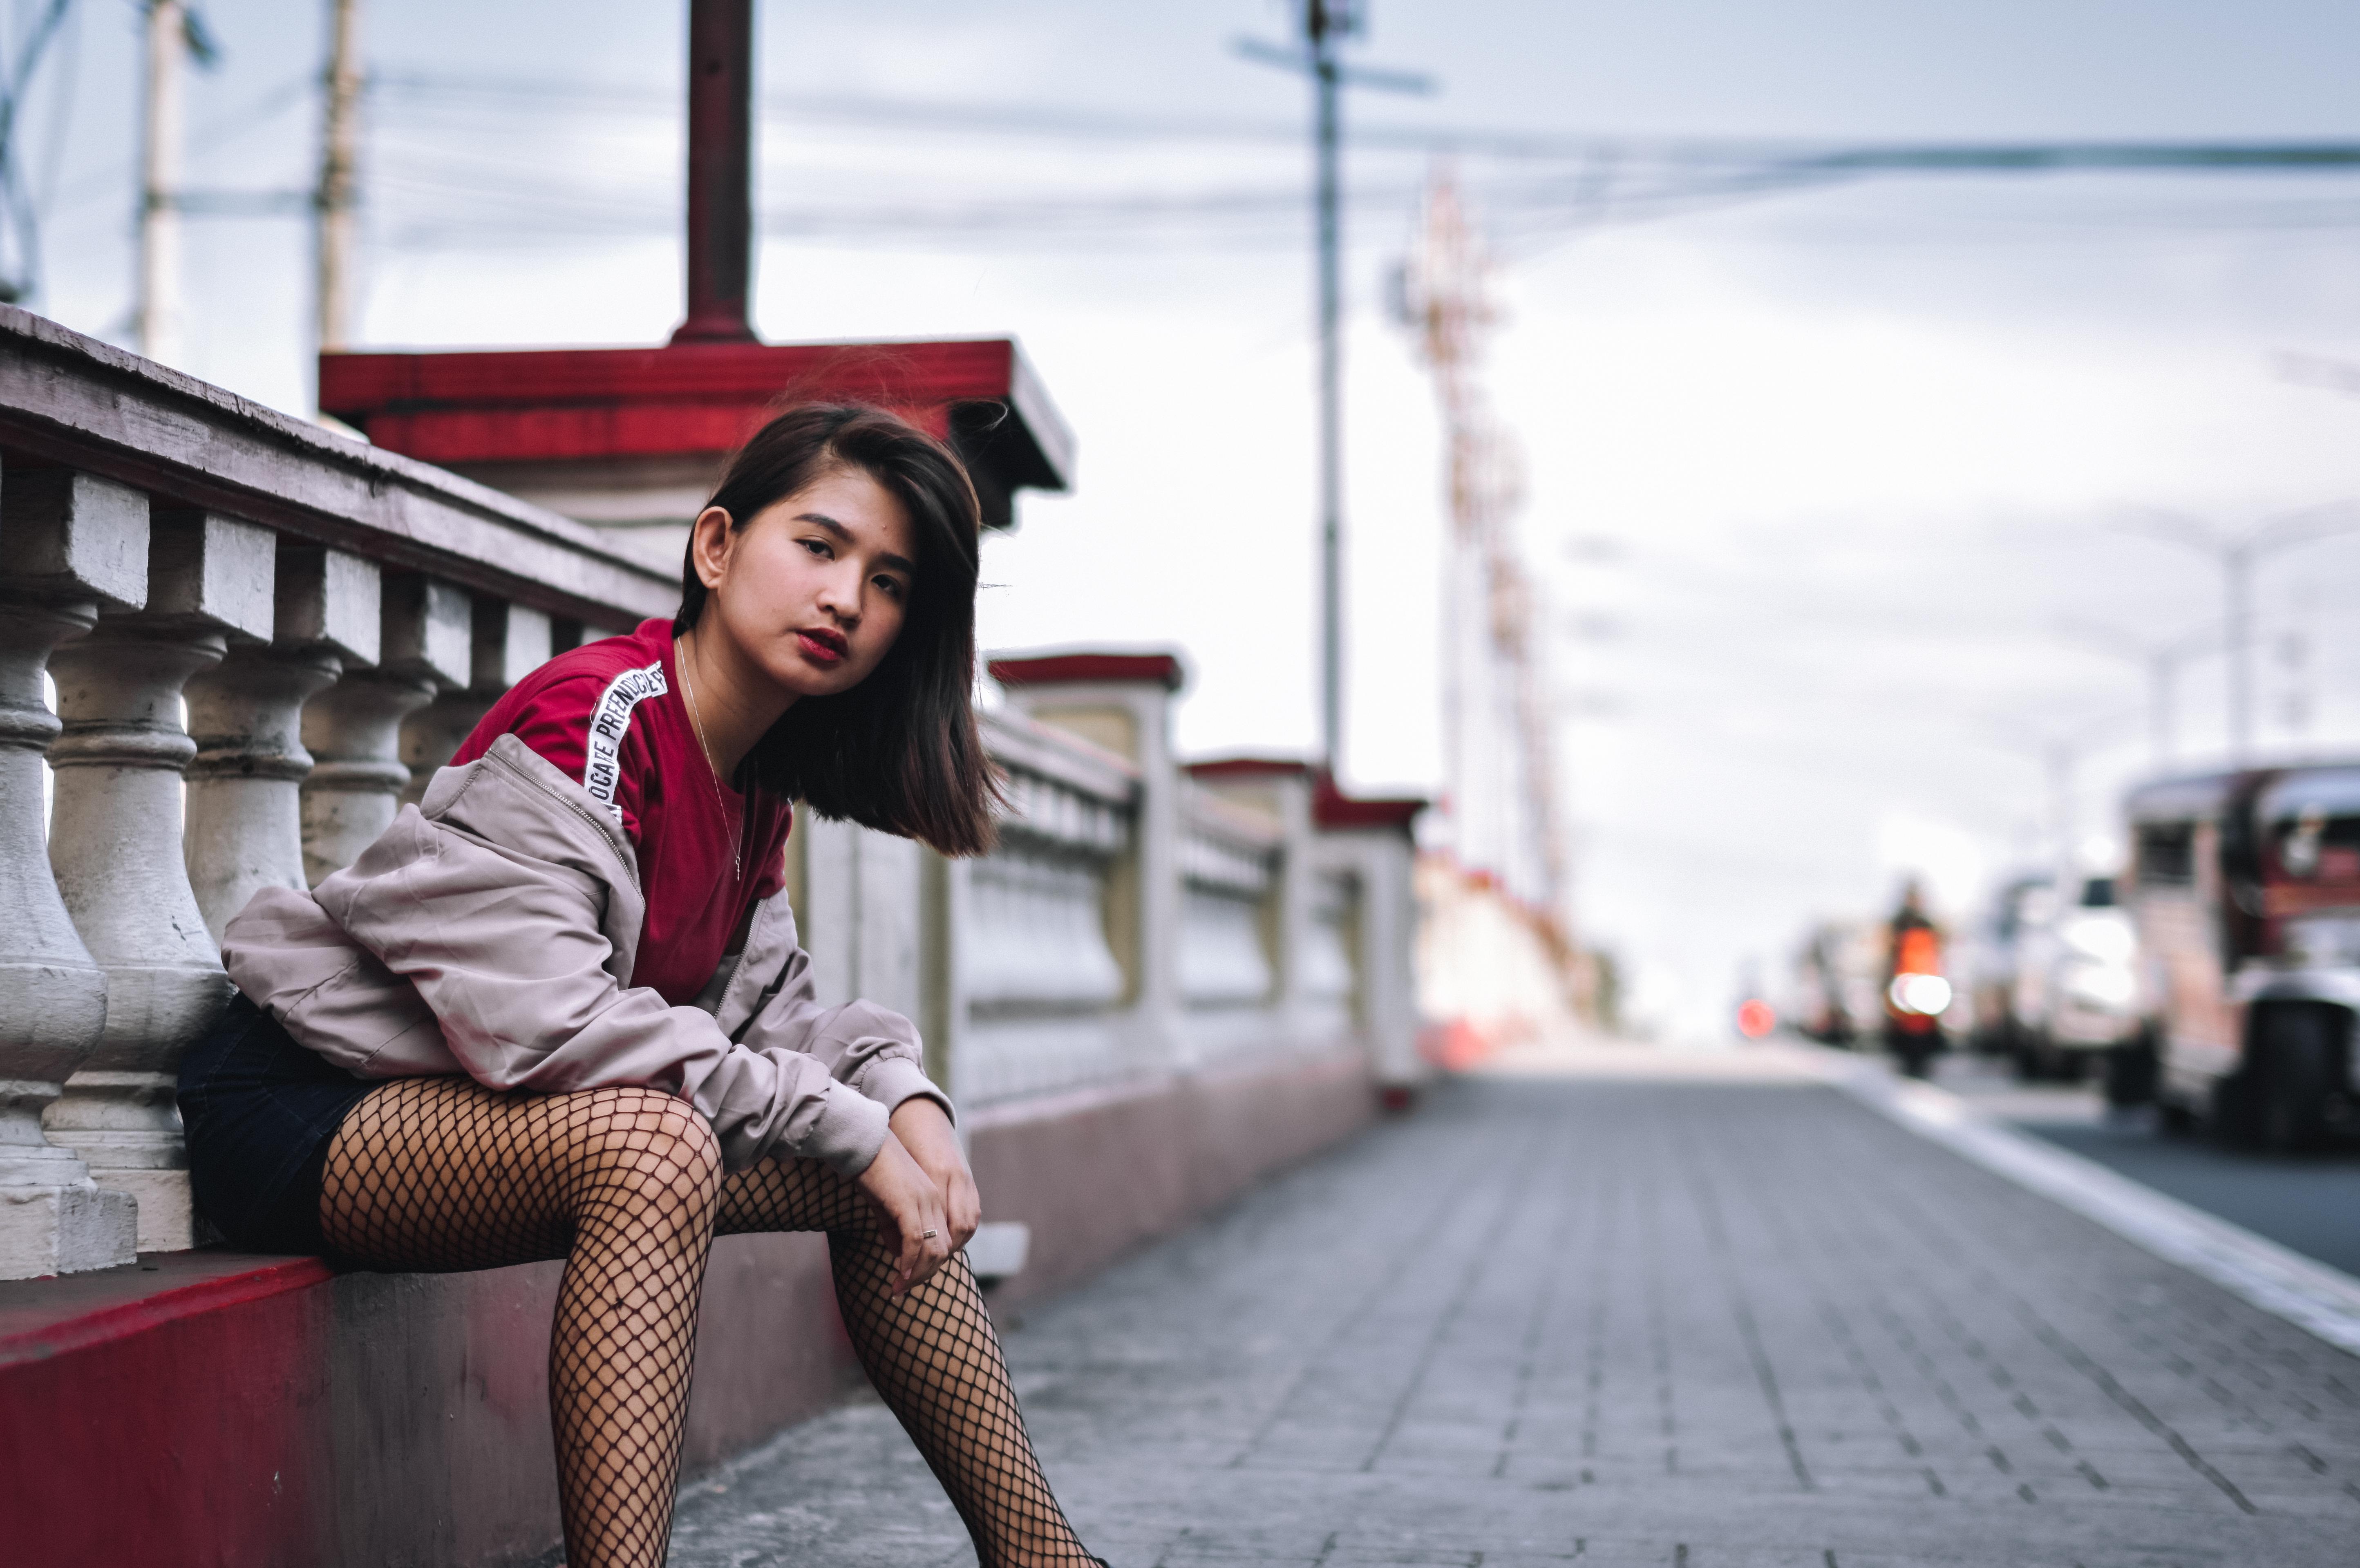 Woman Sitting on Concrete Pavement Near Road